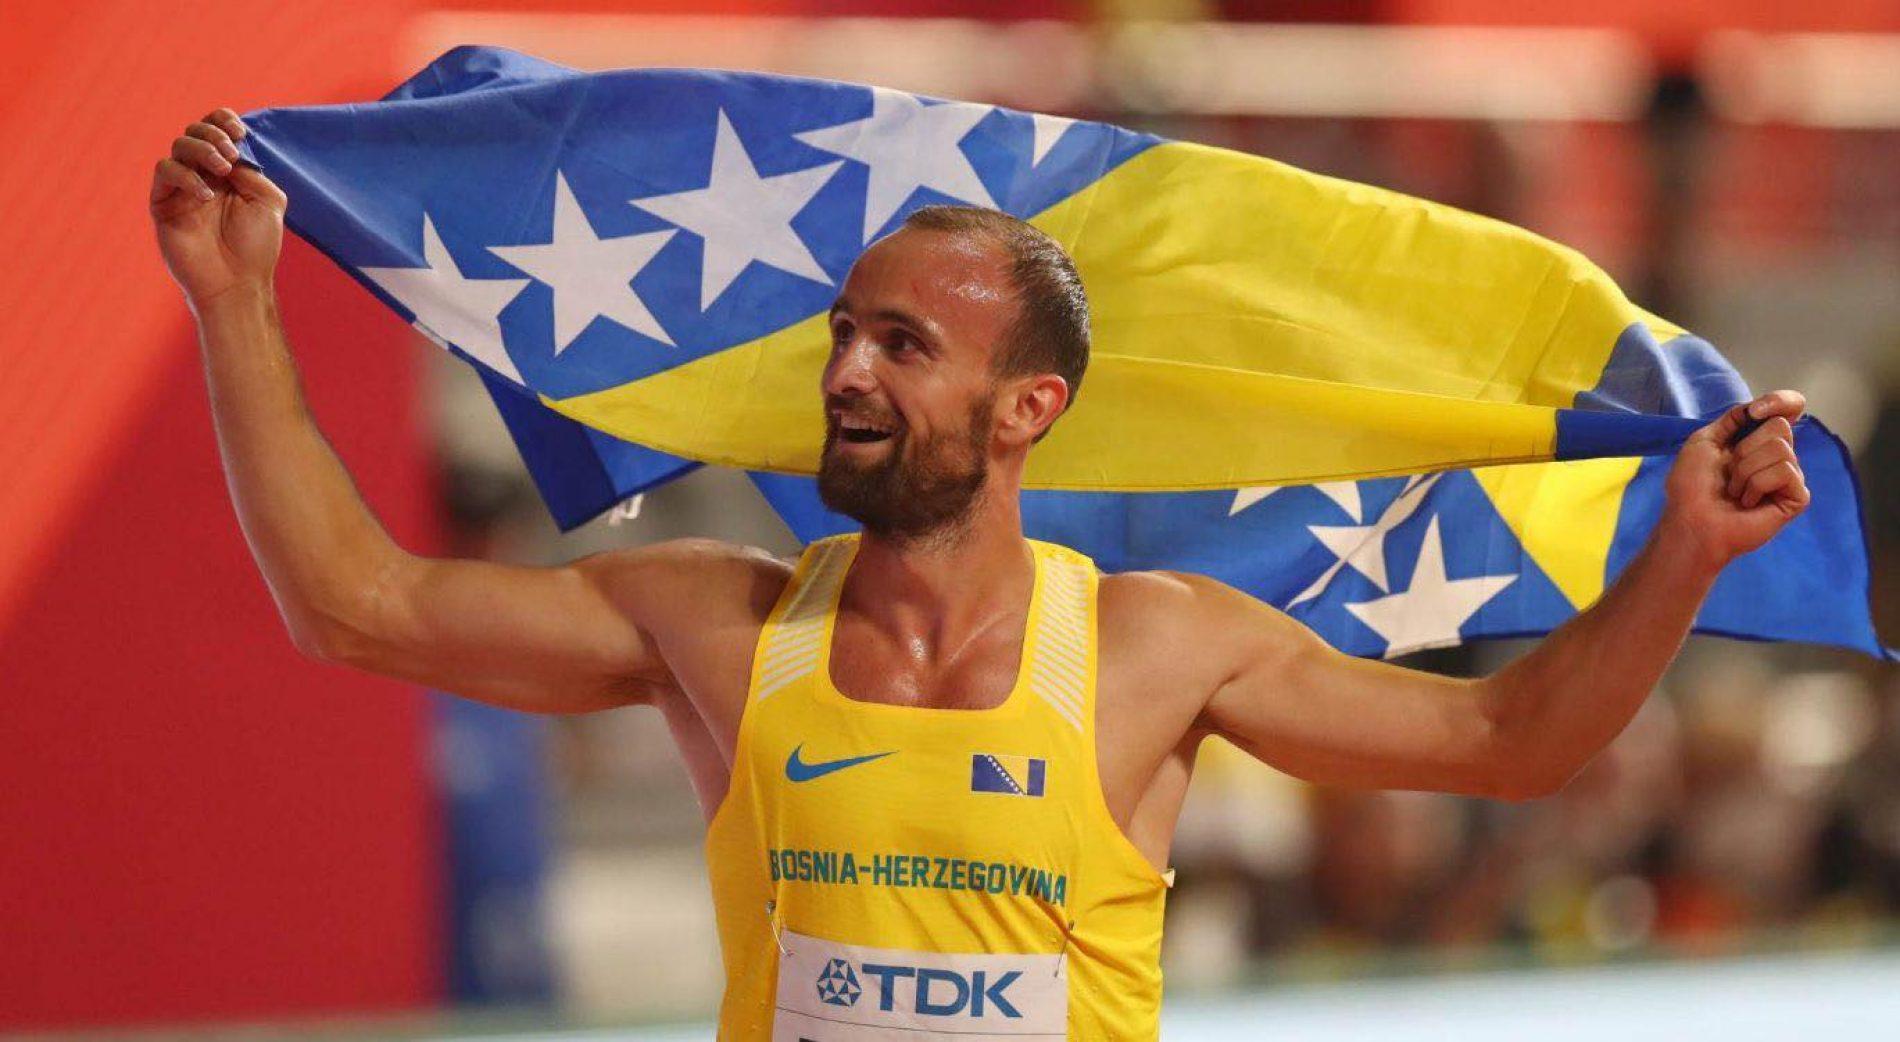 Amel Tuka drugi u Madridu, postavio novi državni dvoranski rekord (Video)